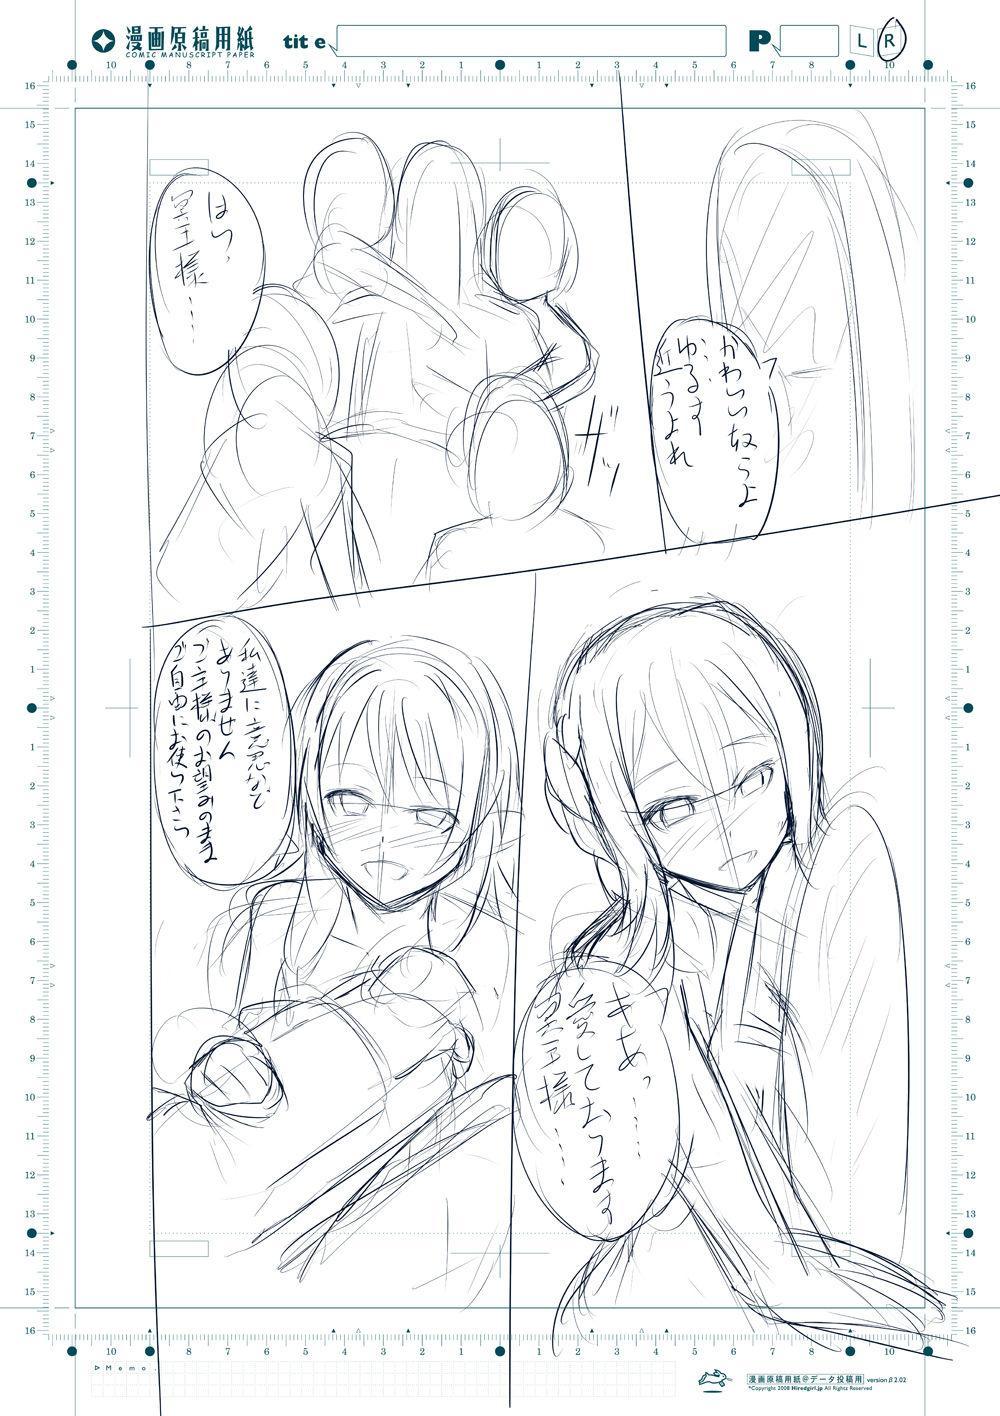 Goblin Slayer Sennou Manga 24